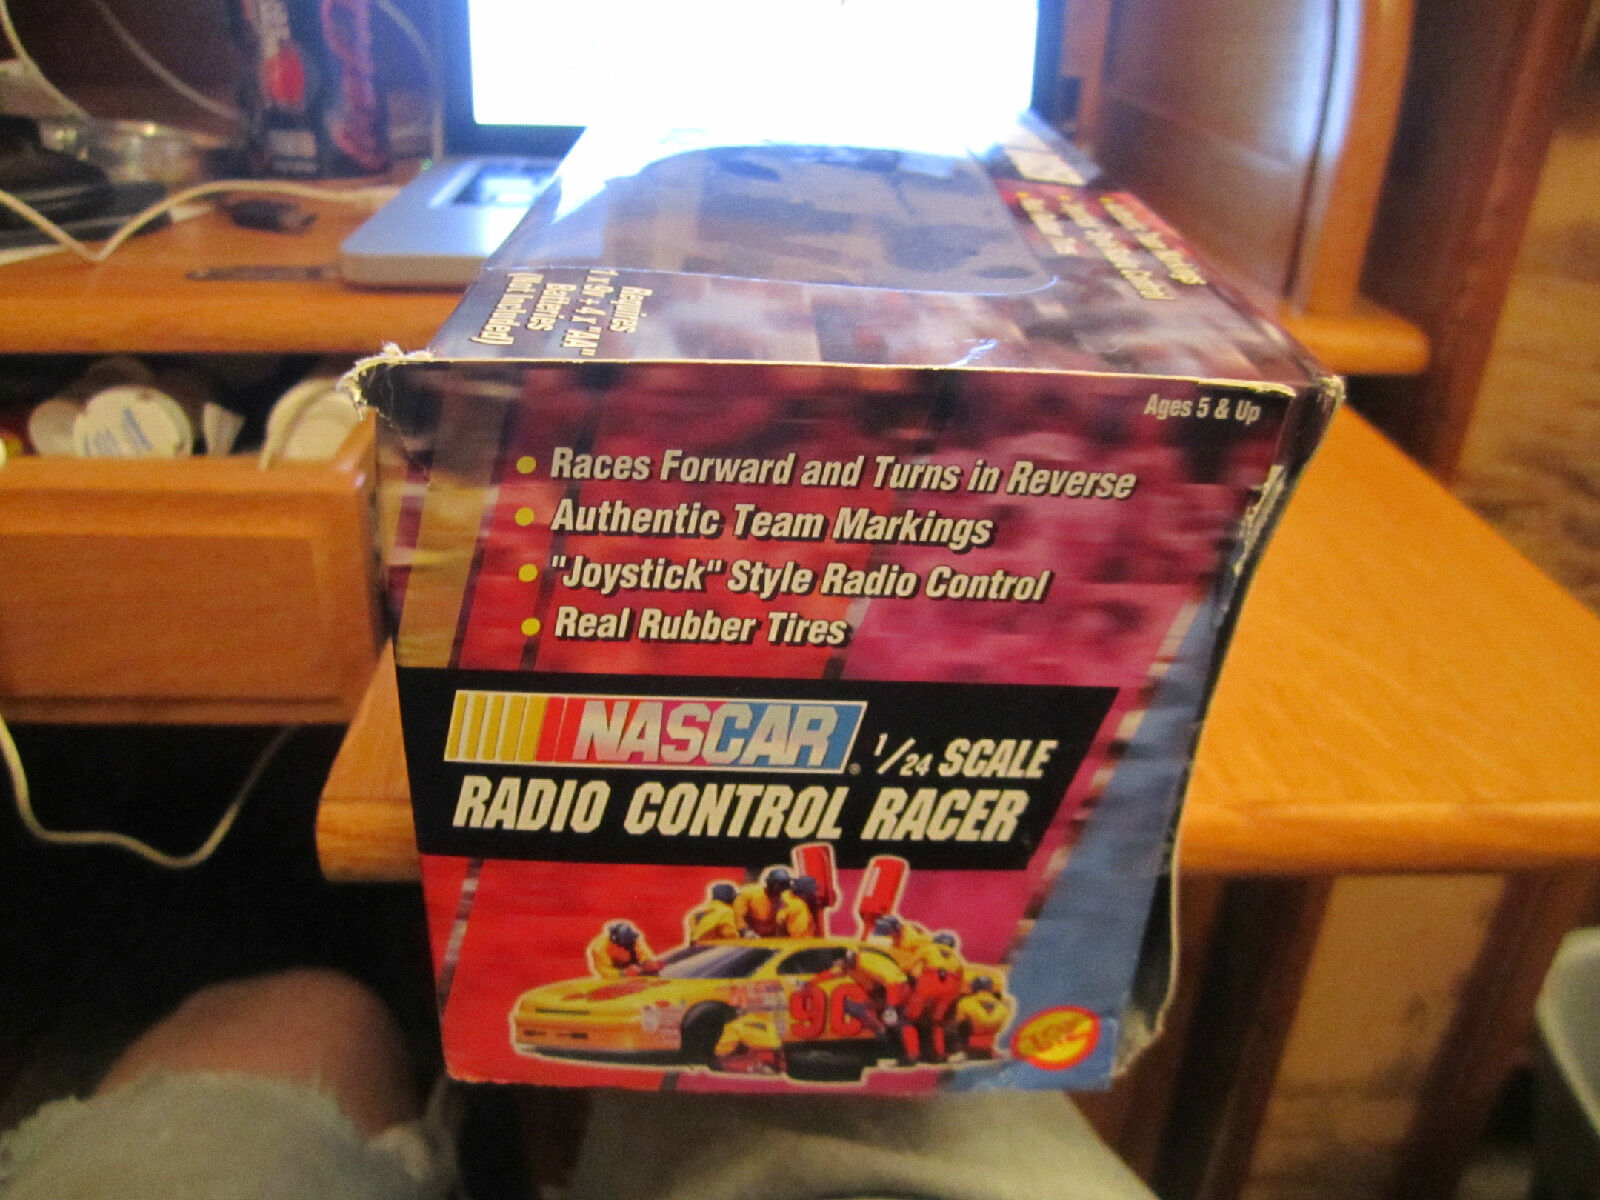 Nasca - radio racer 24 24 24 skala 88 dale jarrett hochwertige betreuung 27mhz 1a7598